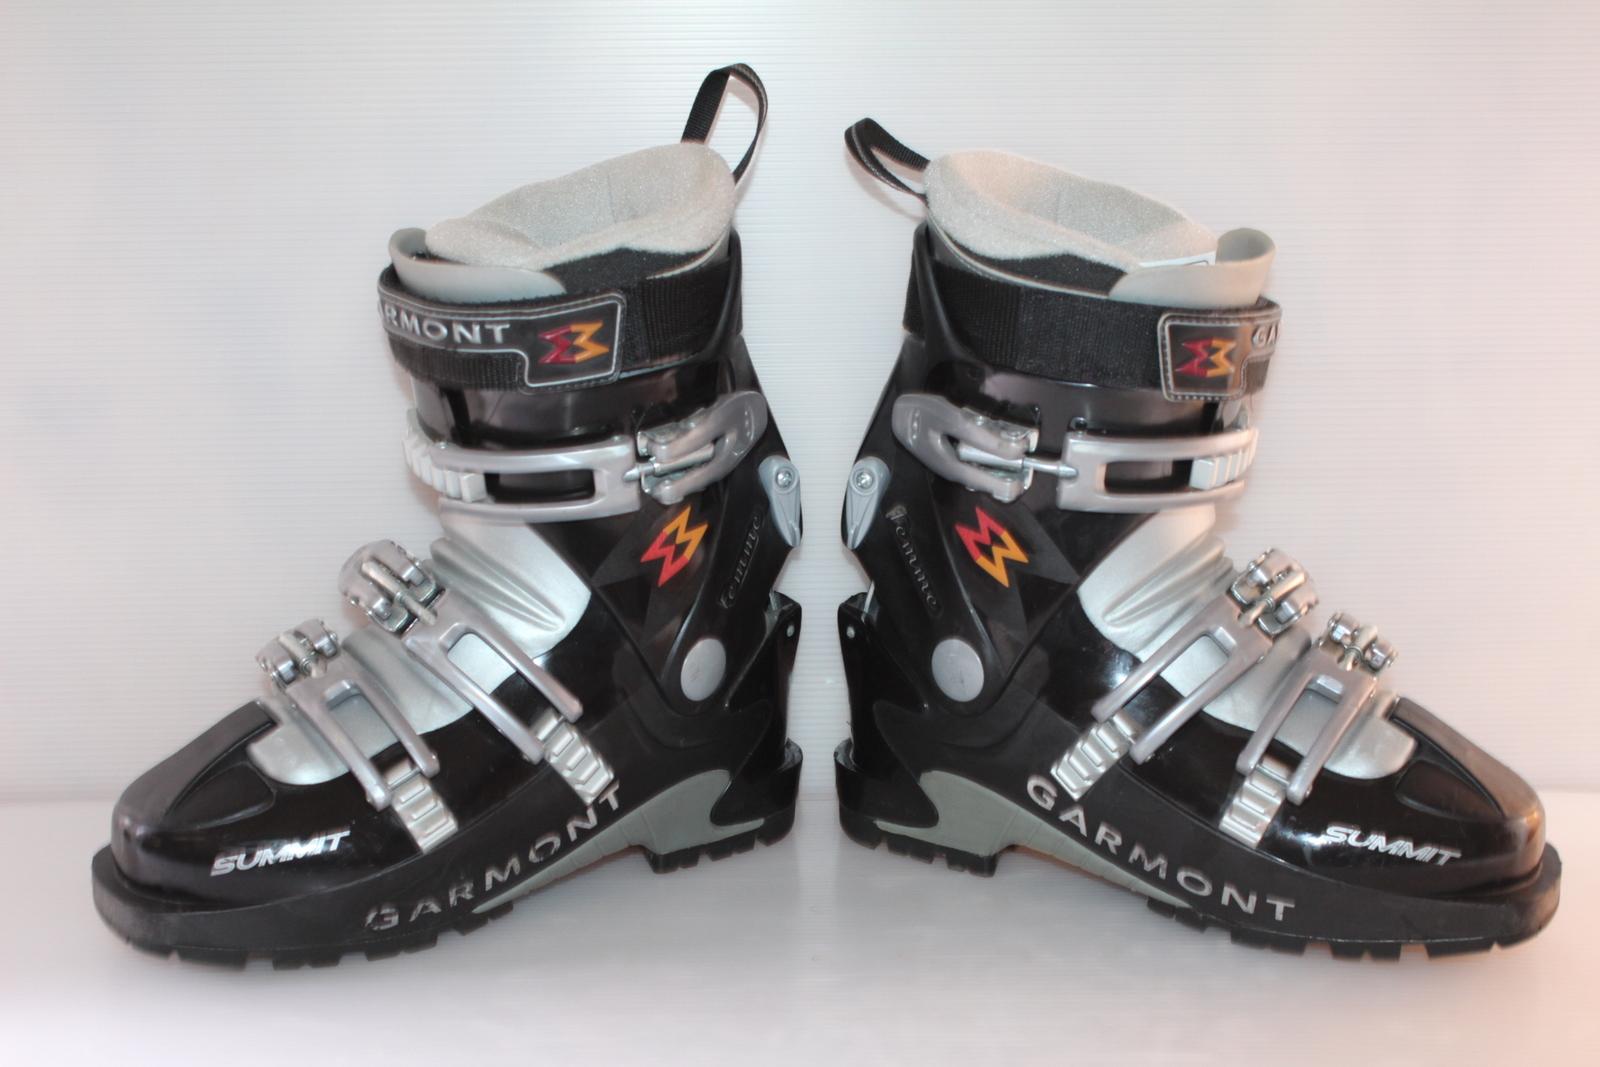 Dámské skialpové boty Garmont Summit - skialp vel. EU38